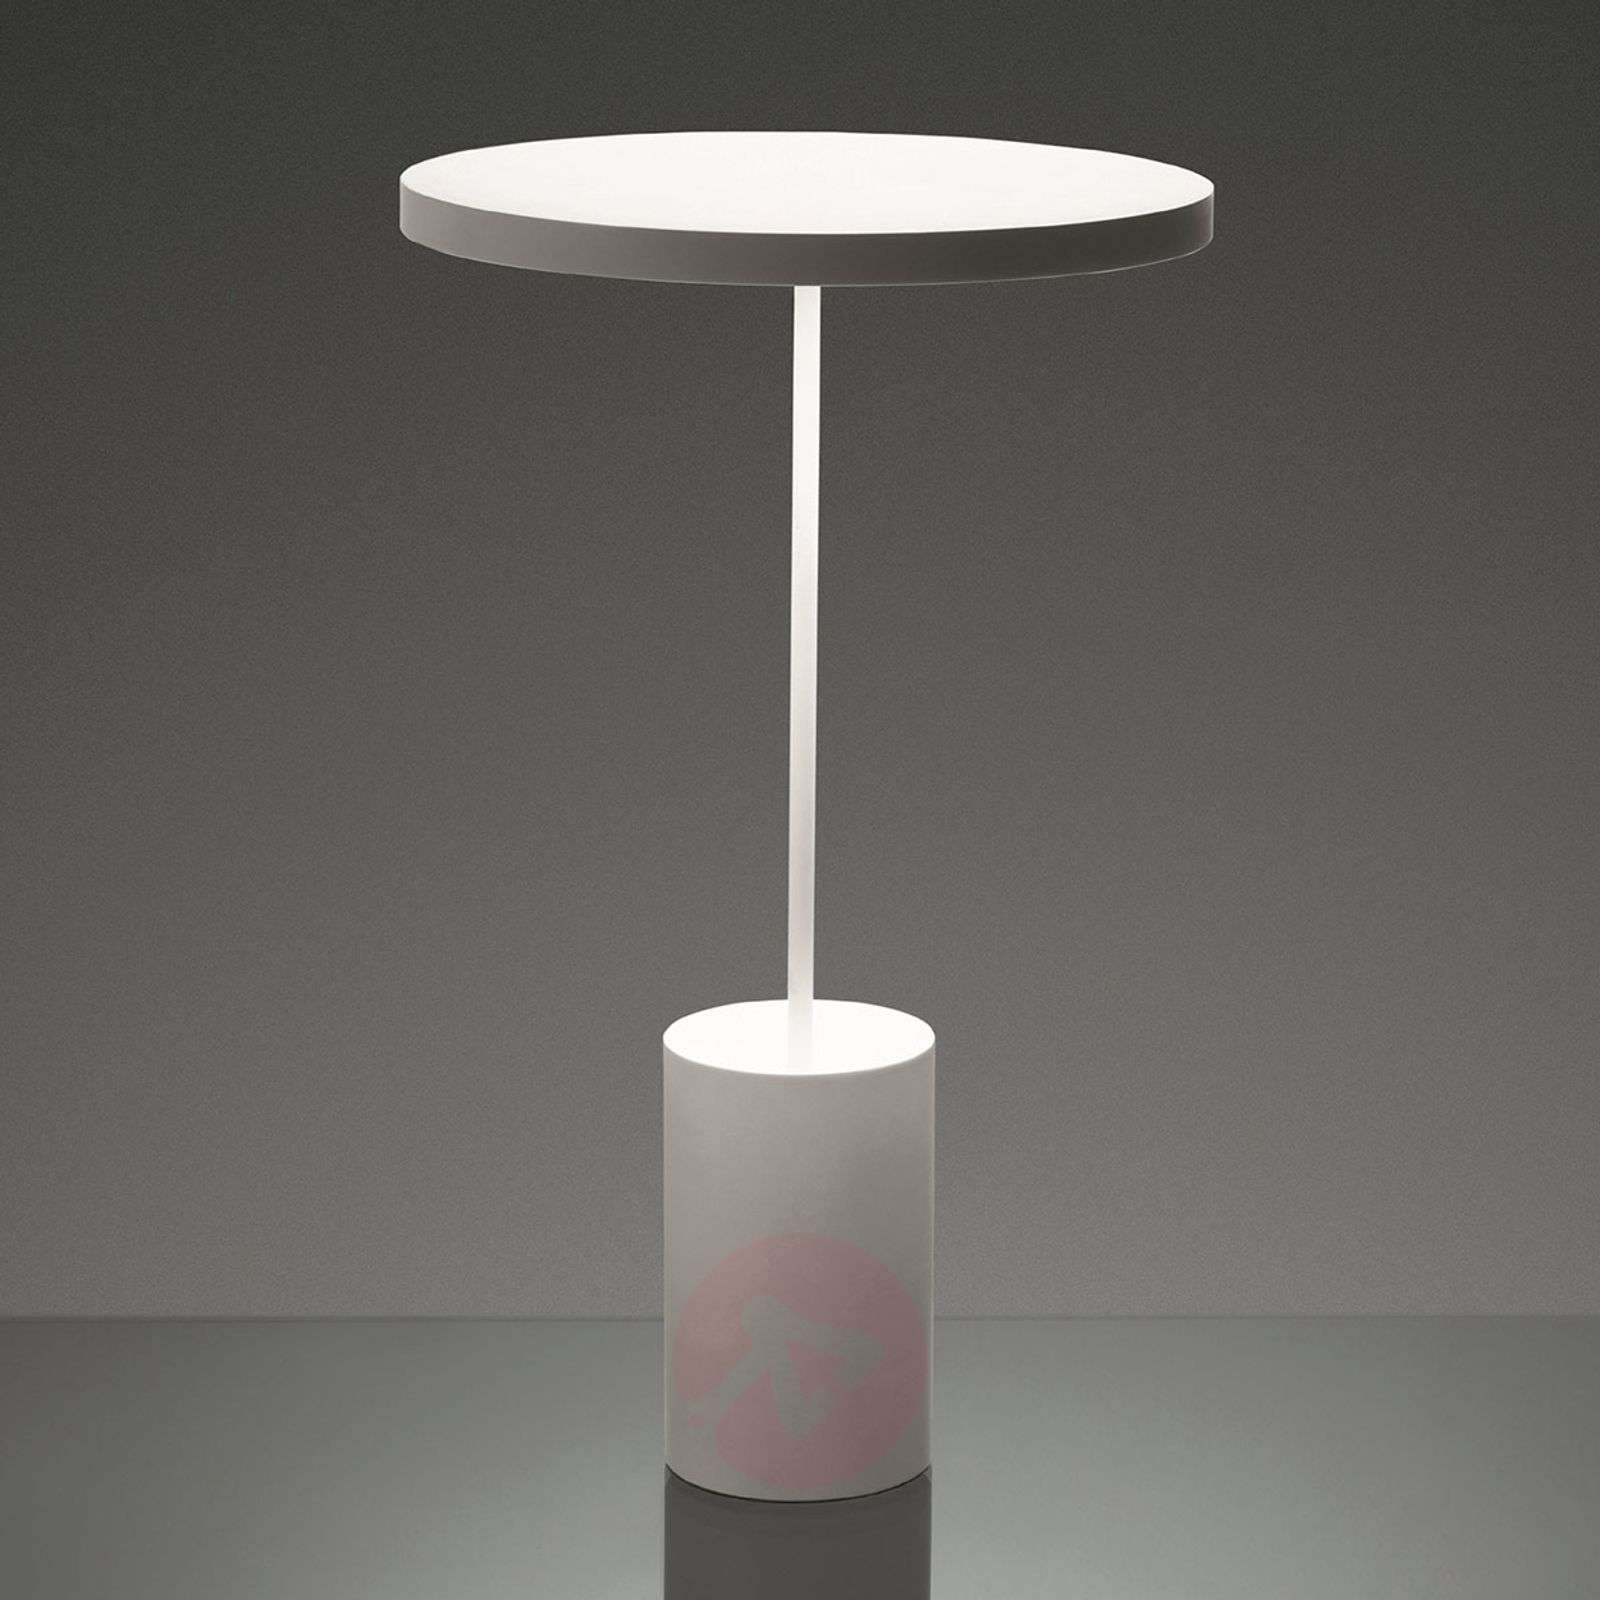 Artemide Sisifo LED table lamp in white-1060133-01